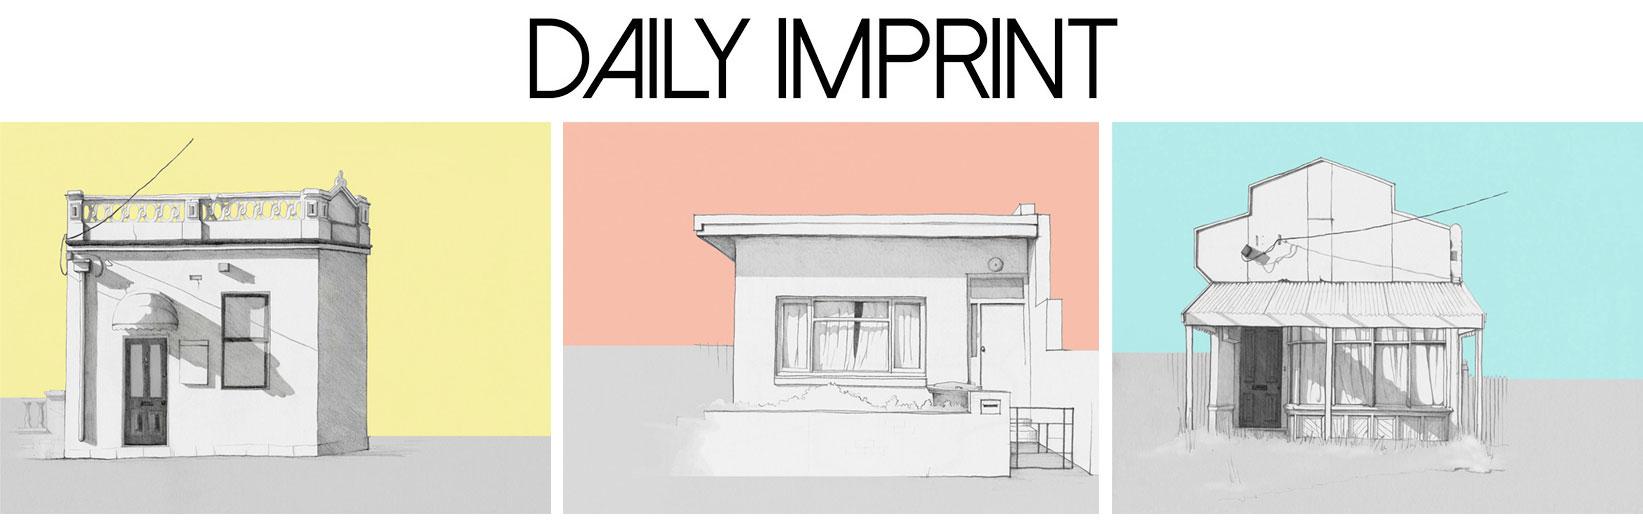 Mairead-Murphy_Daily-Imptint